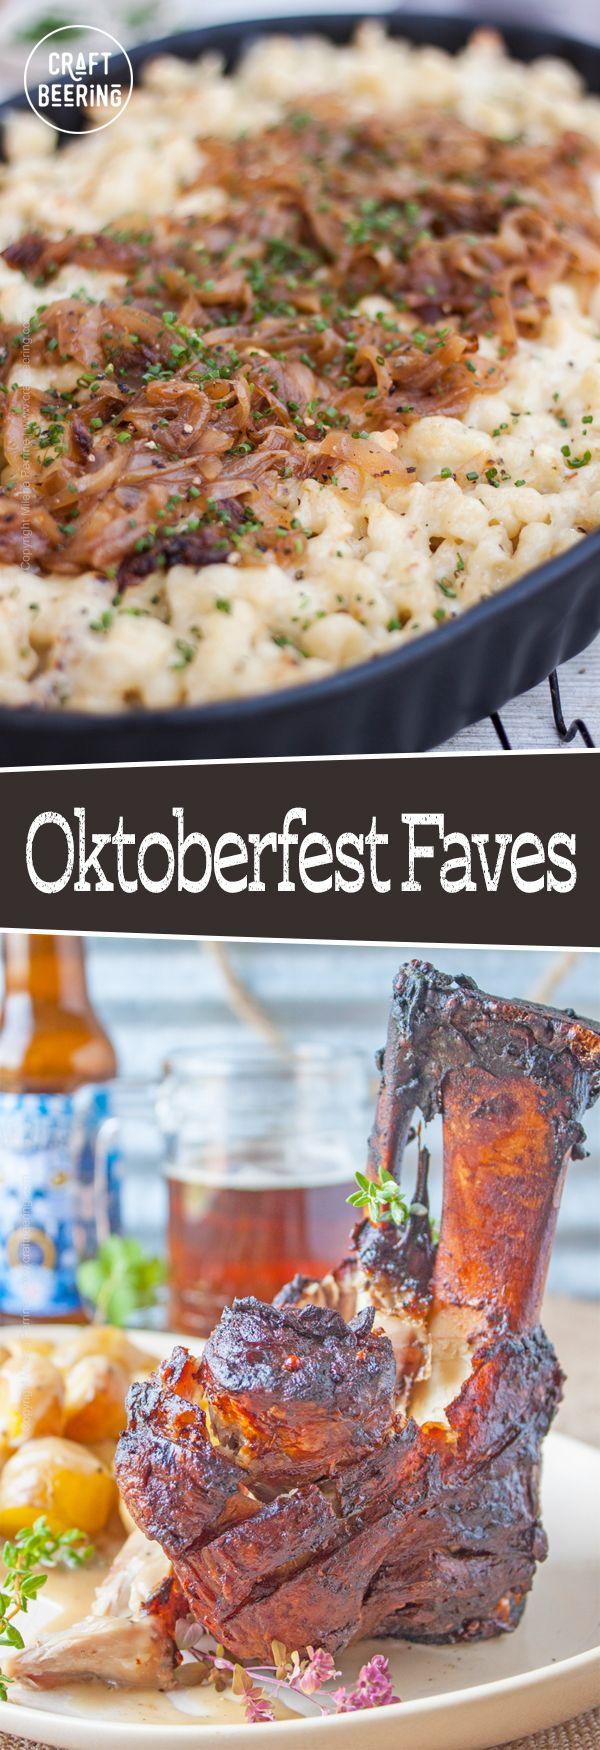 Beer Garden Menu (With images) Oktoberfest food